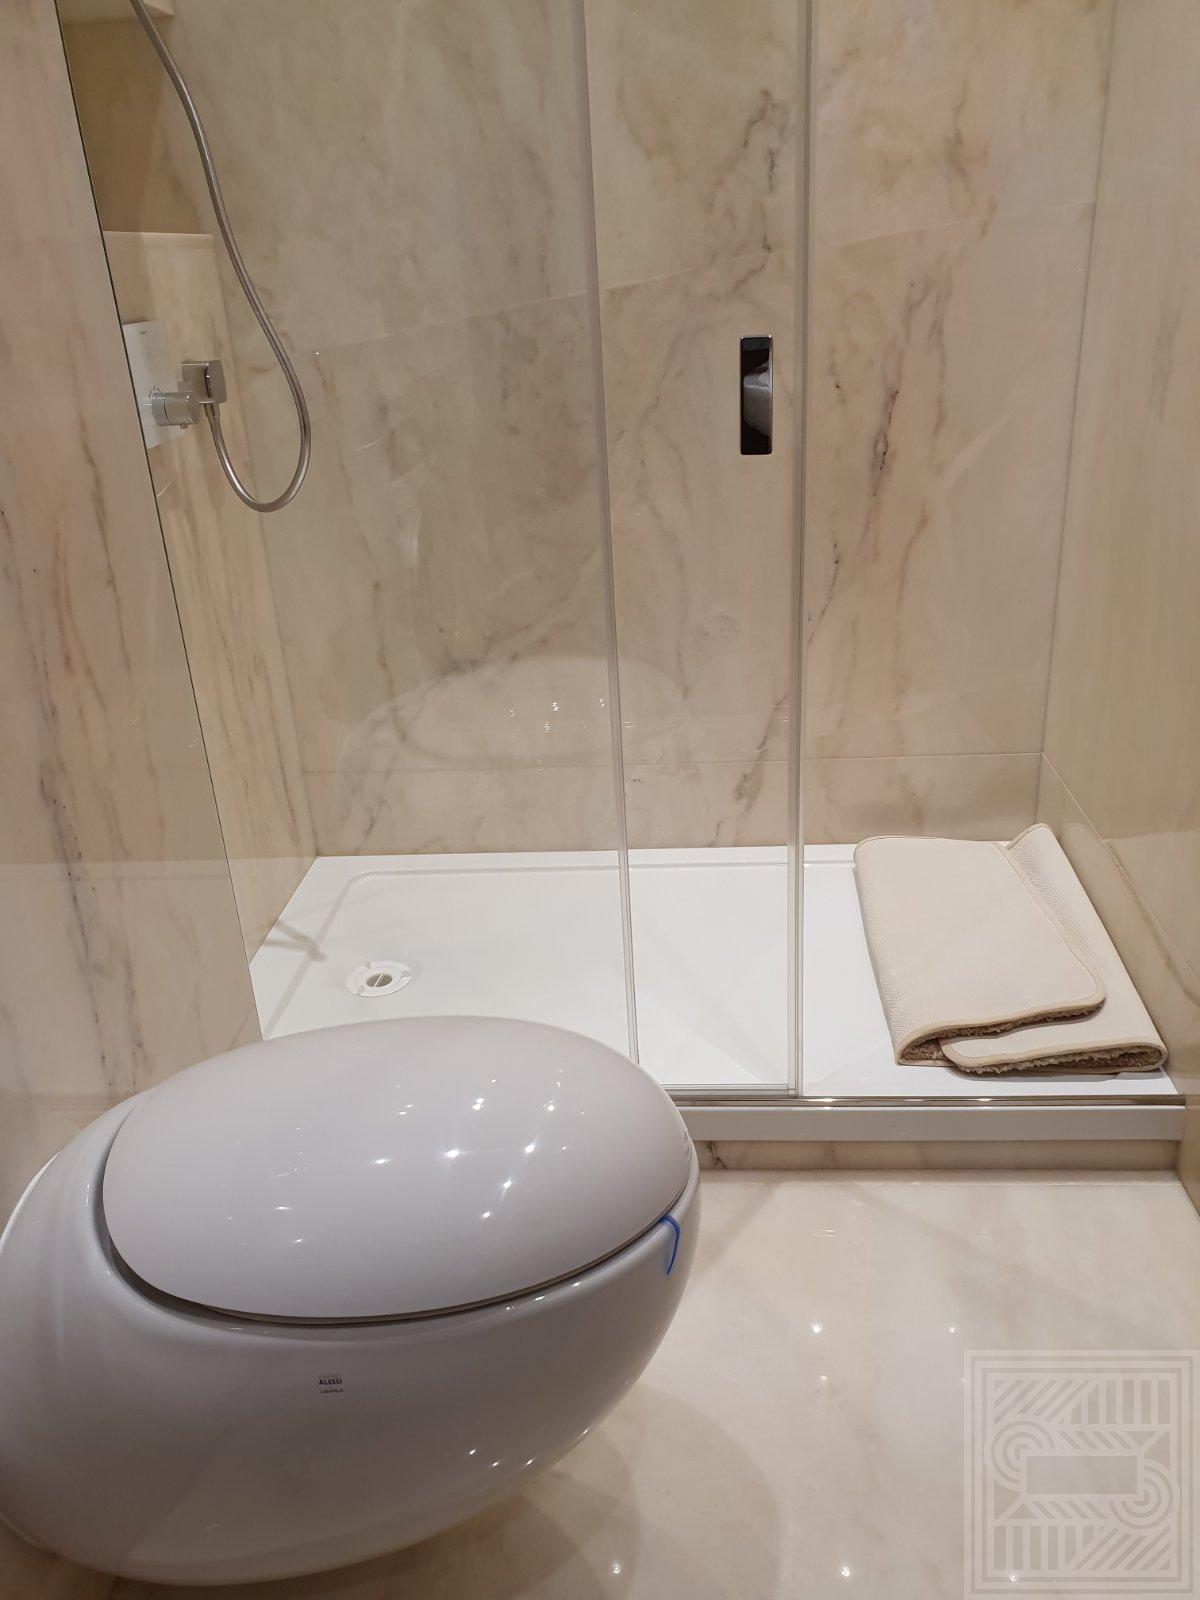 Ванная комната облицованная мрамором Extremos walls - IMG 4a9d1424dbe5d47da15e70a9ff279f4e V